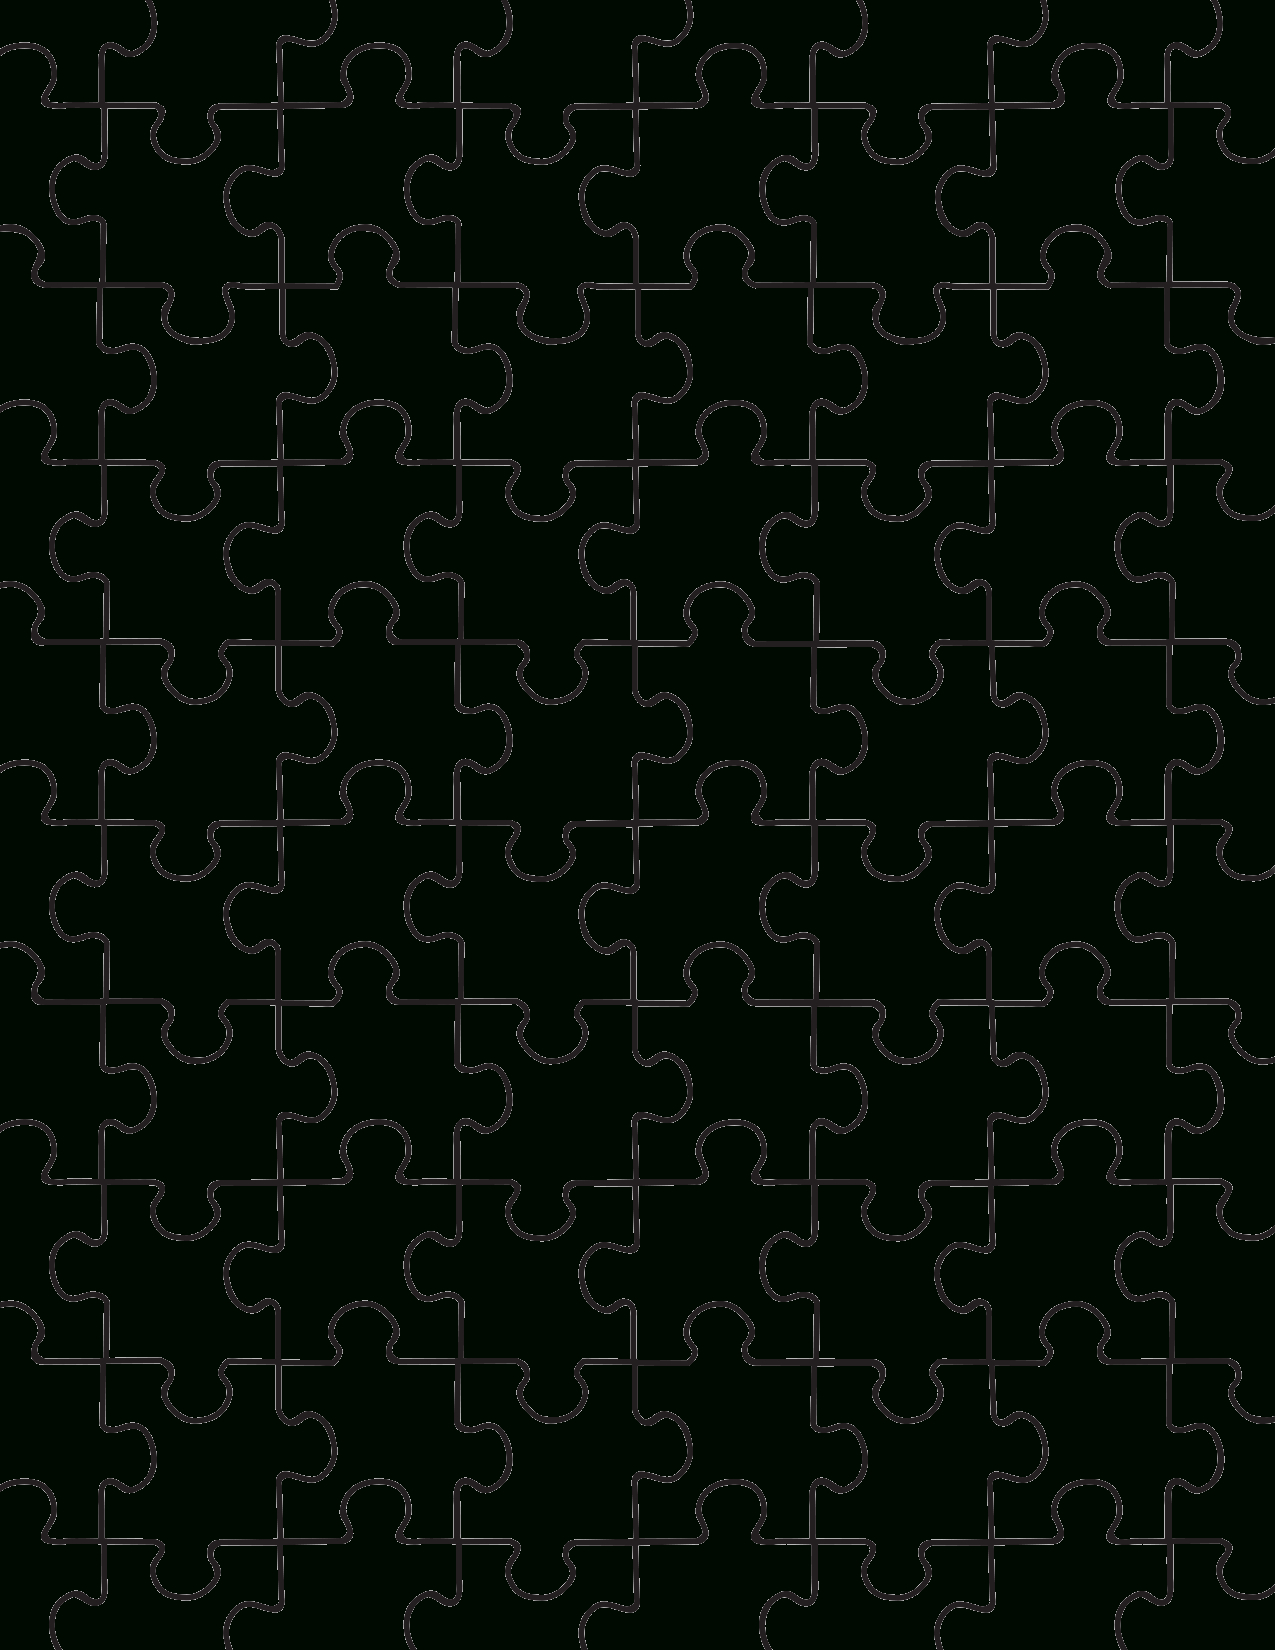 Printable Puzzle Pieces Template   Lovetoknow - Printable Puzzle Template Pdf